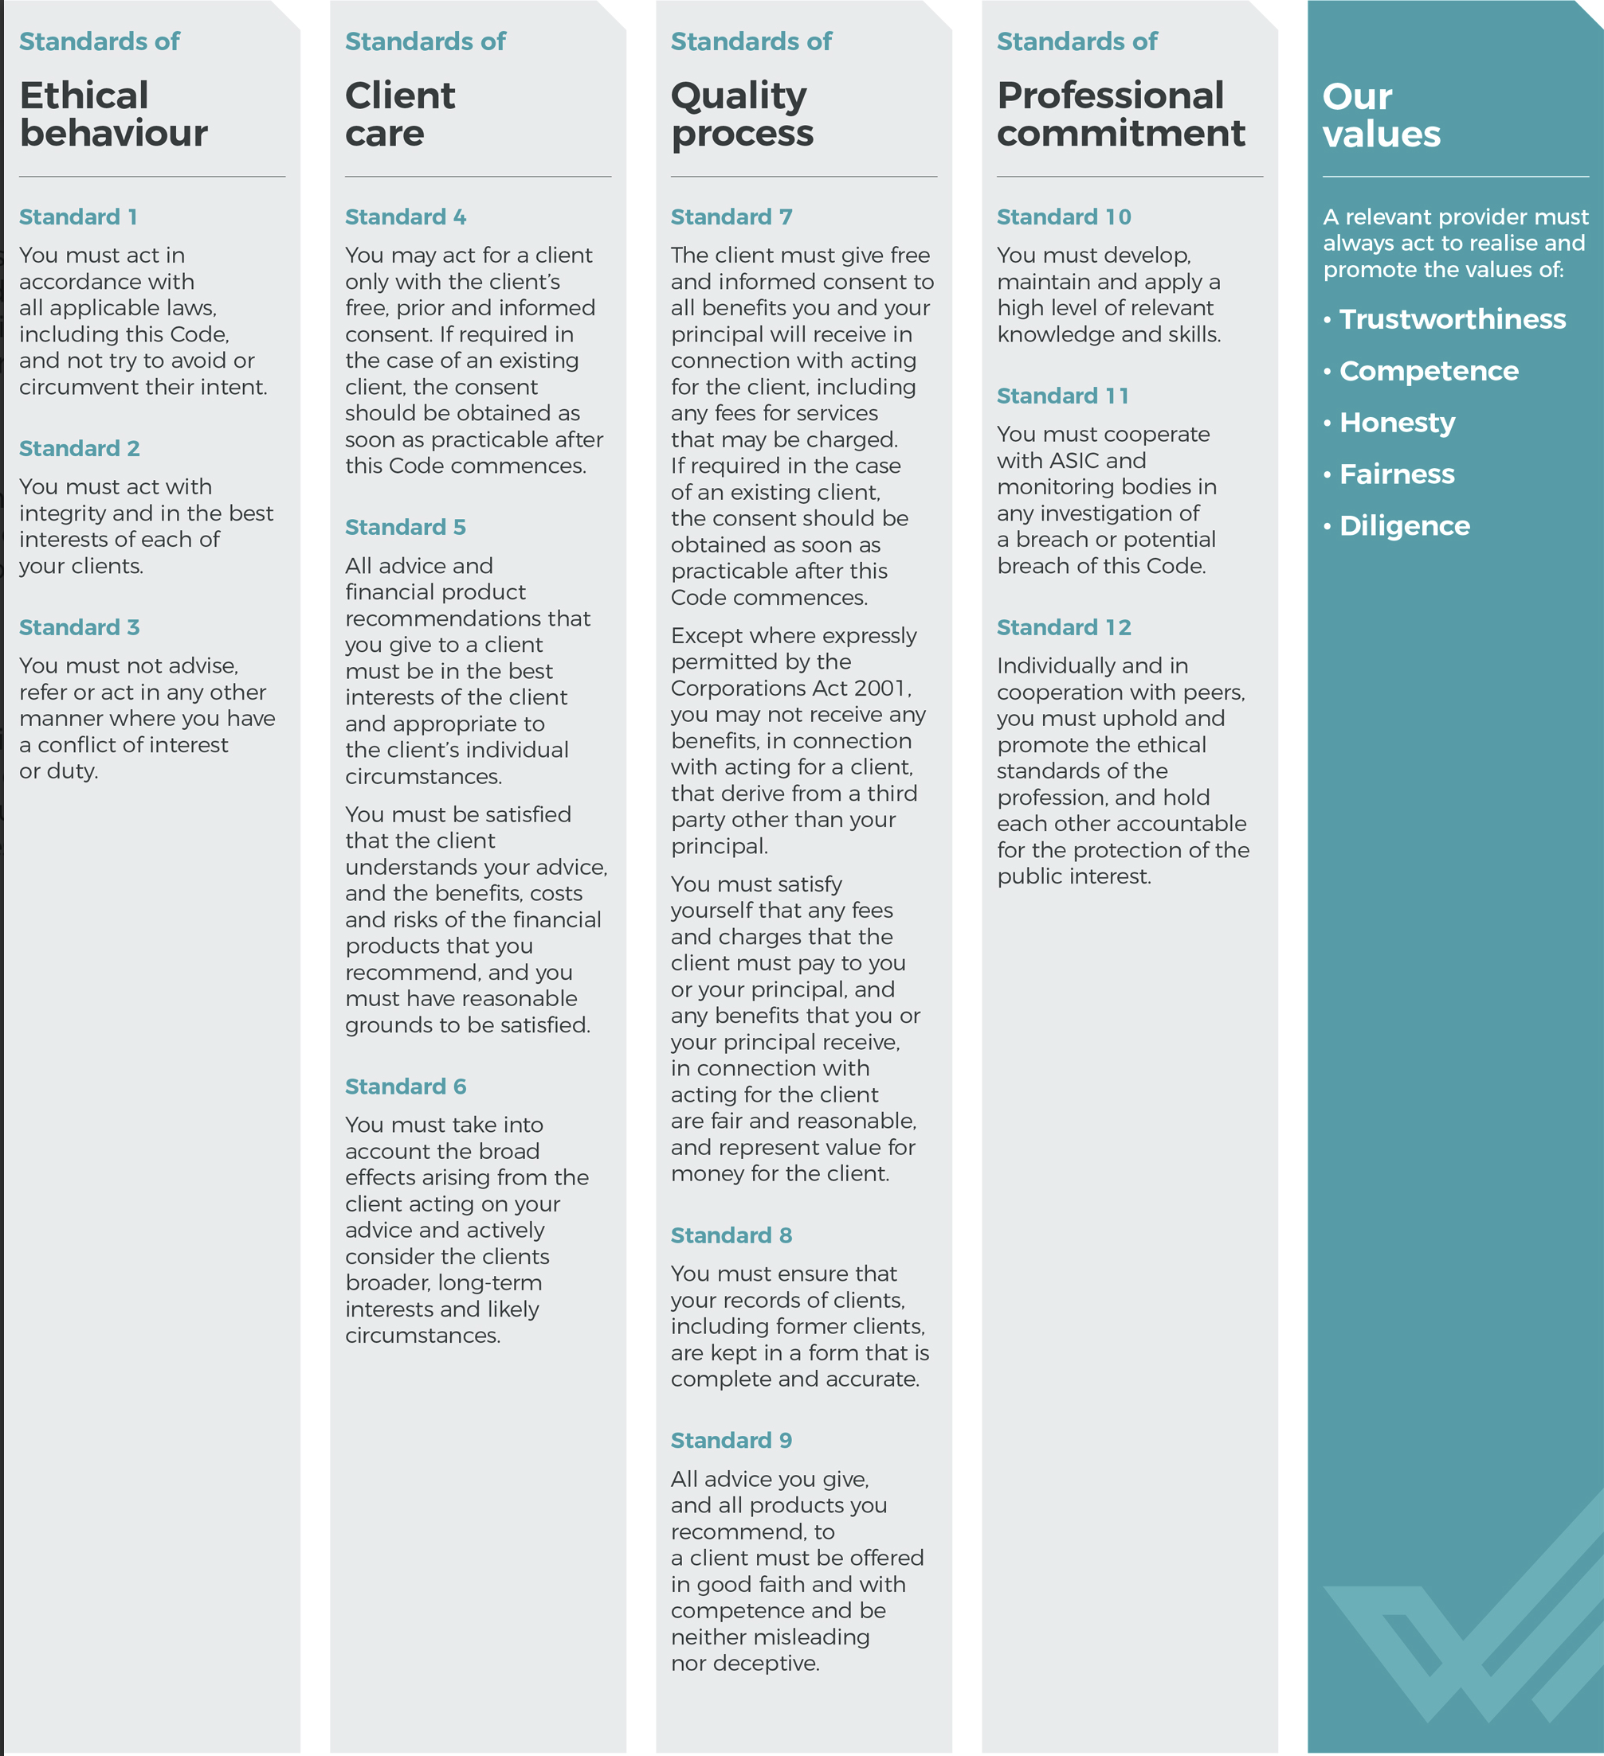 FASEA Code of Ethics  https://www.fasea.gov.au/code-of-ethics/